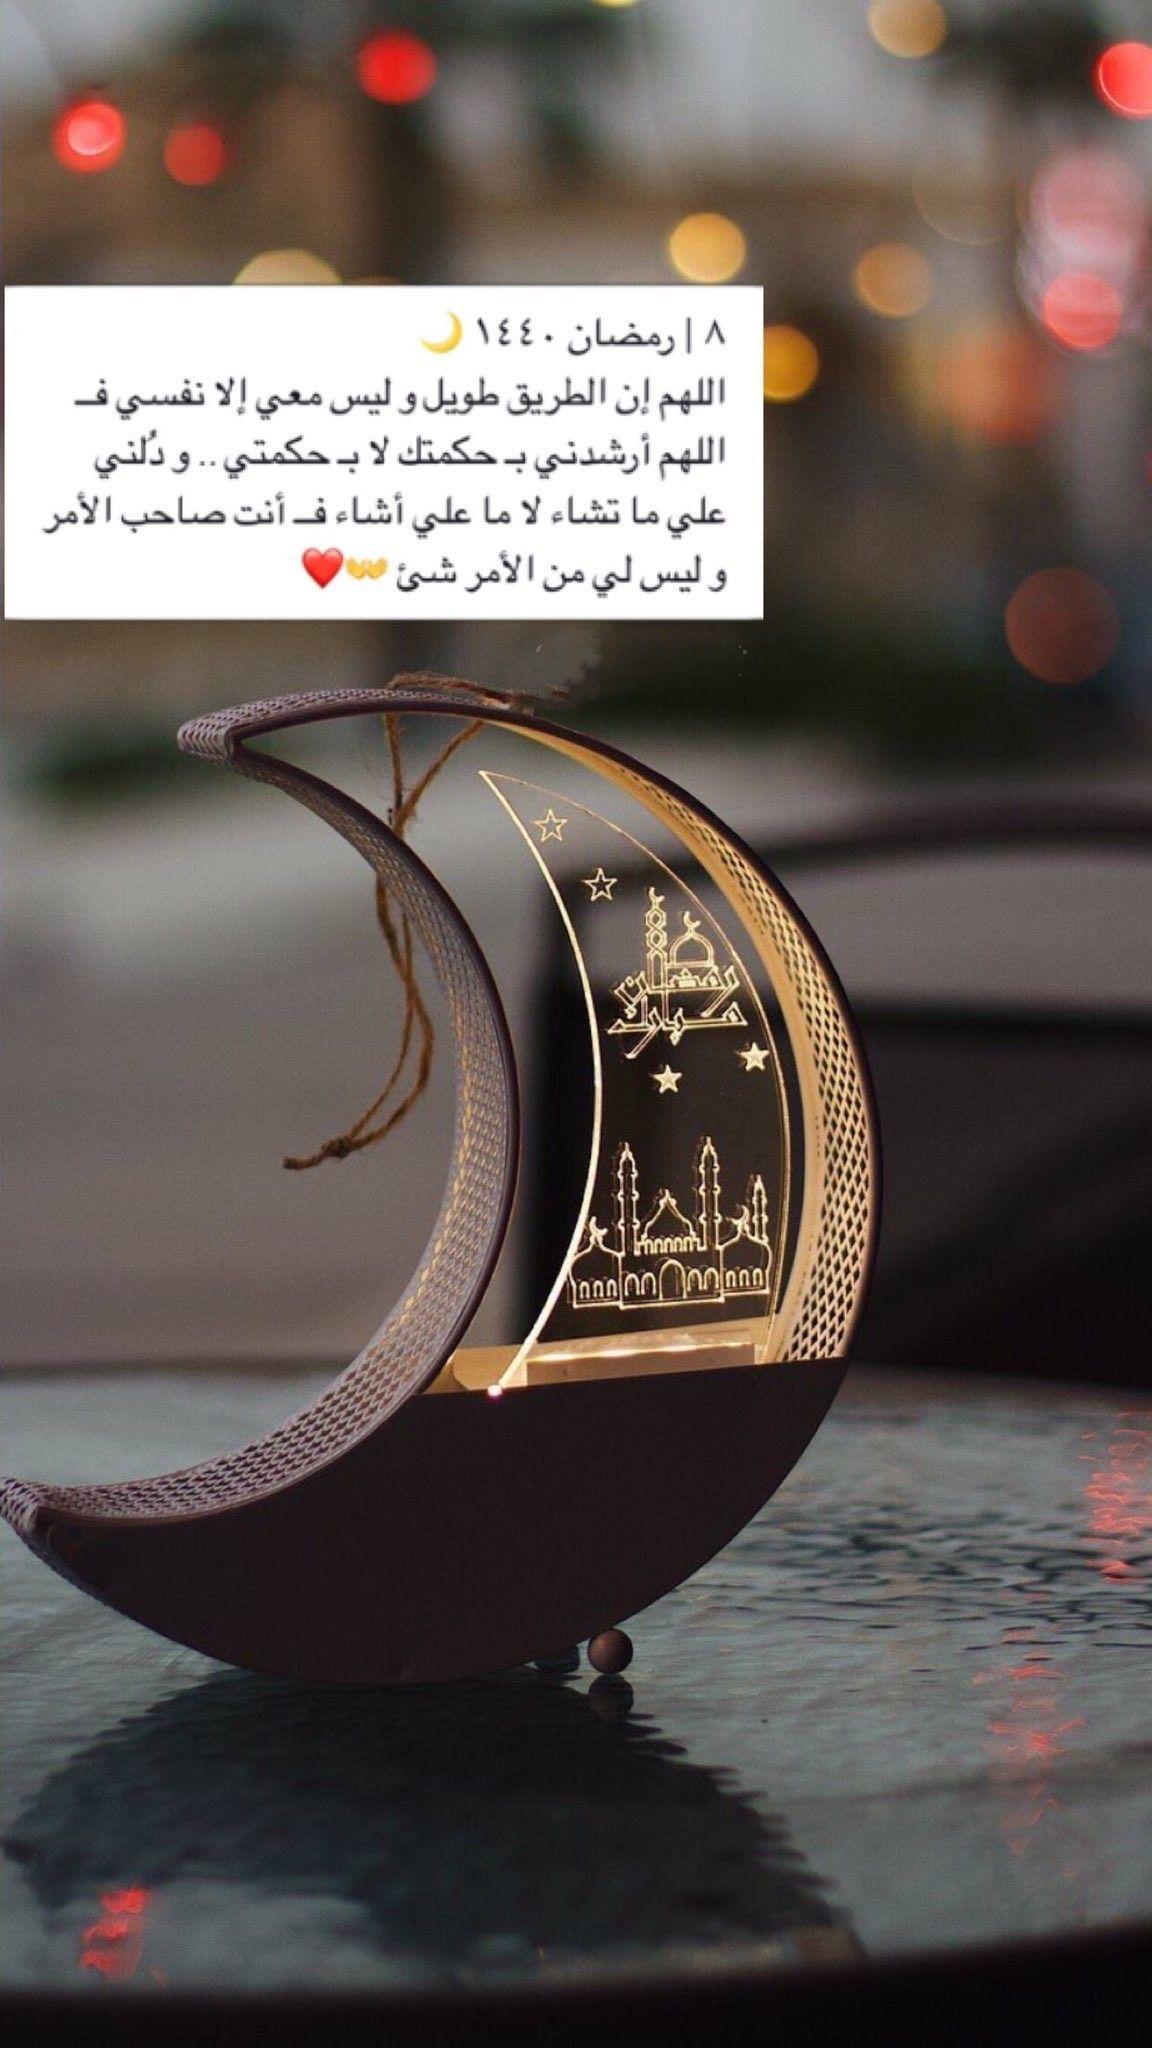 Pin By The Moon On Ramadan Kareem Ramadan Quotes Ramadan Prayer Ramadan